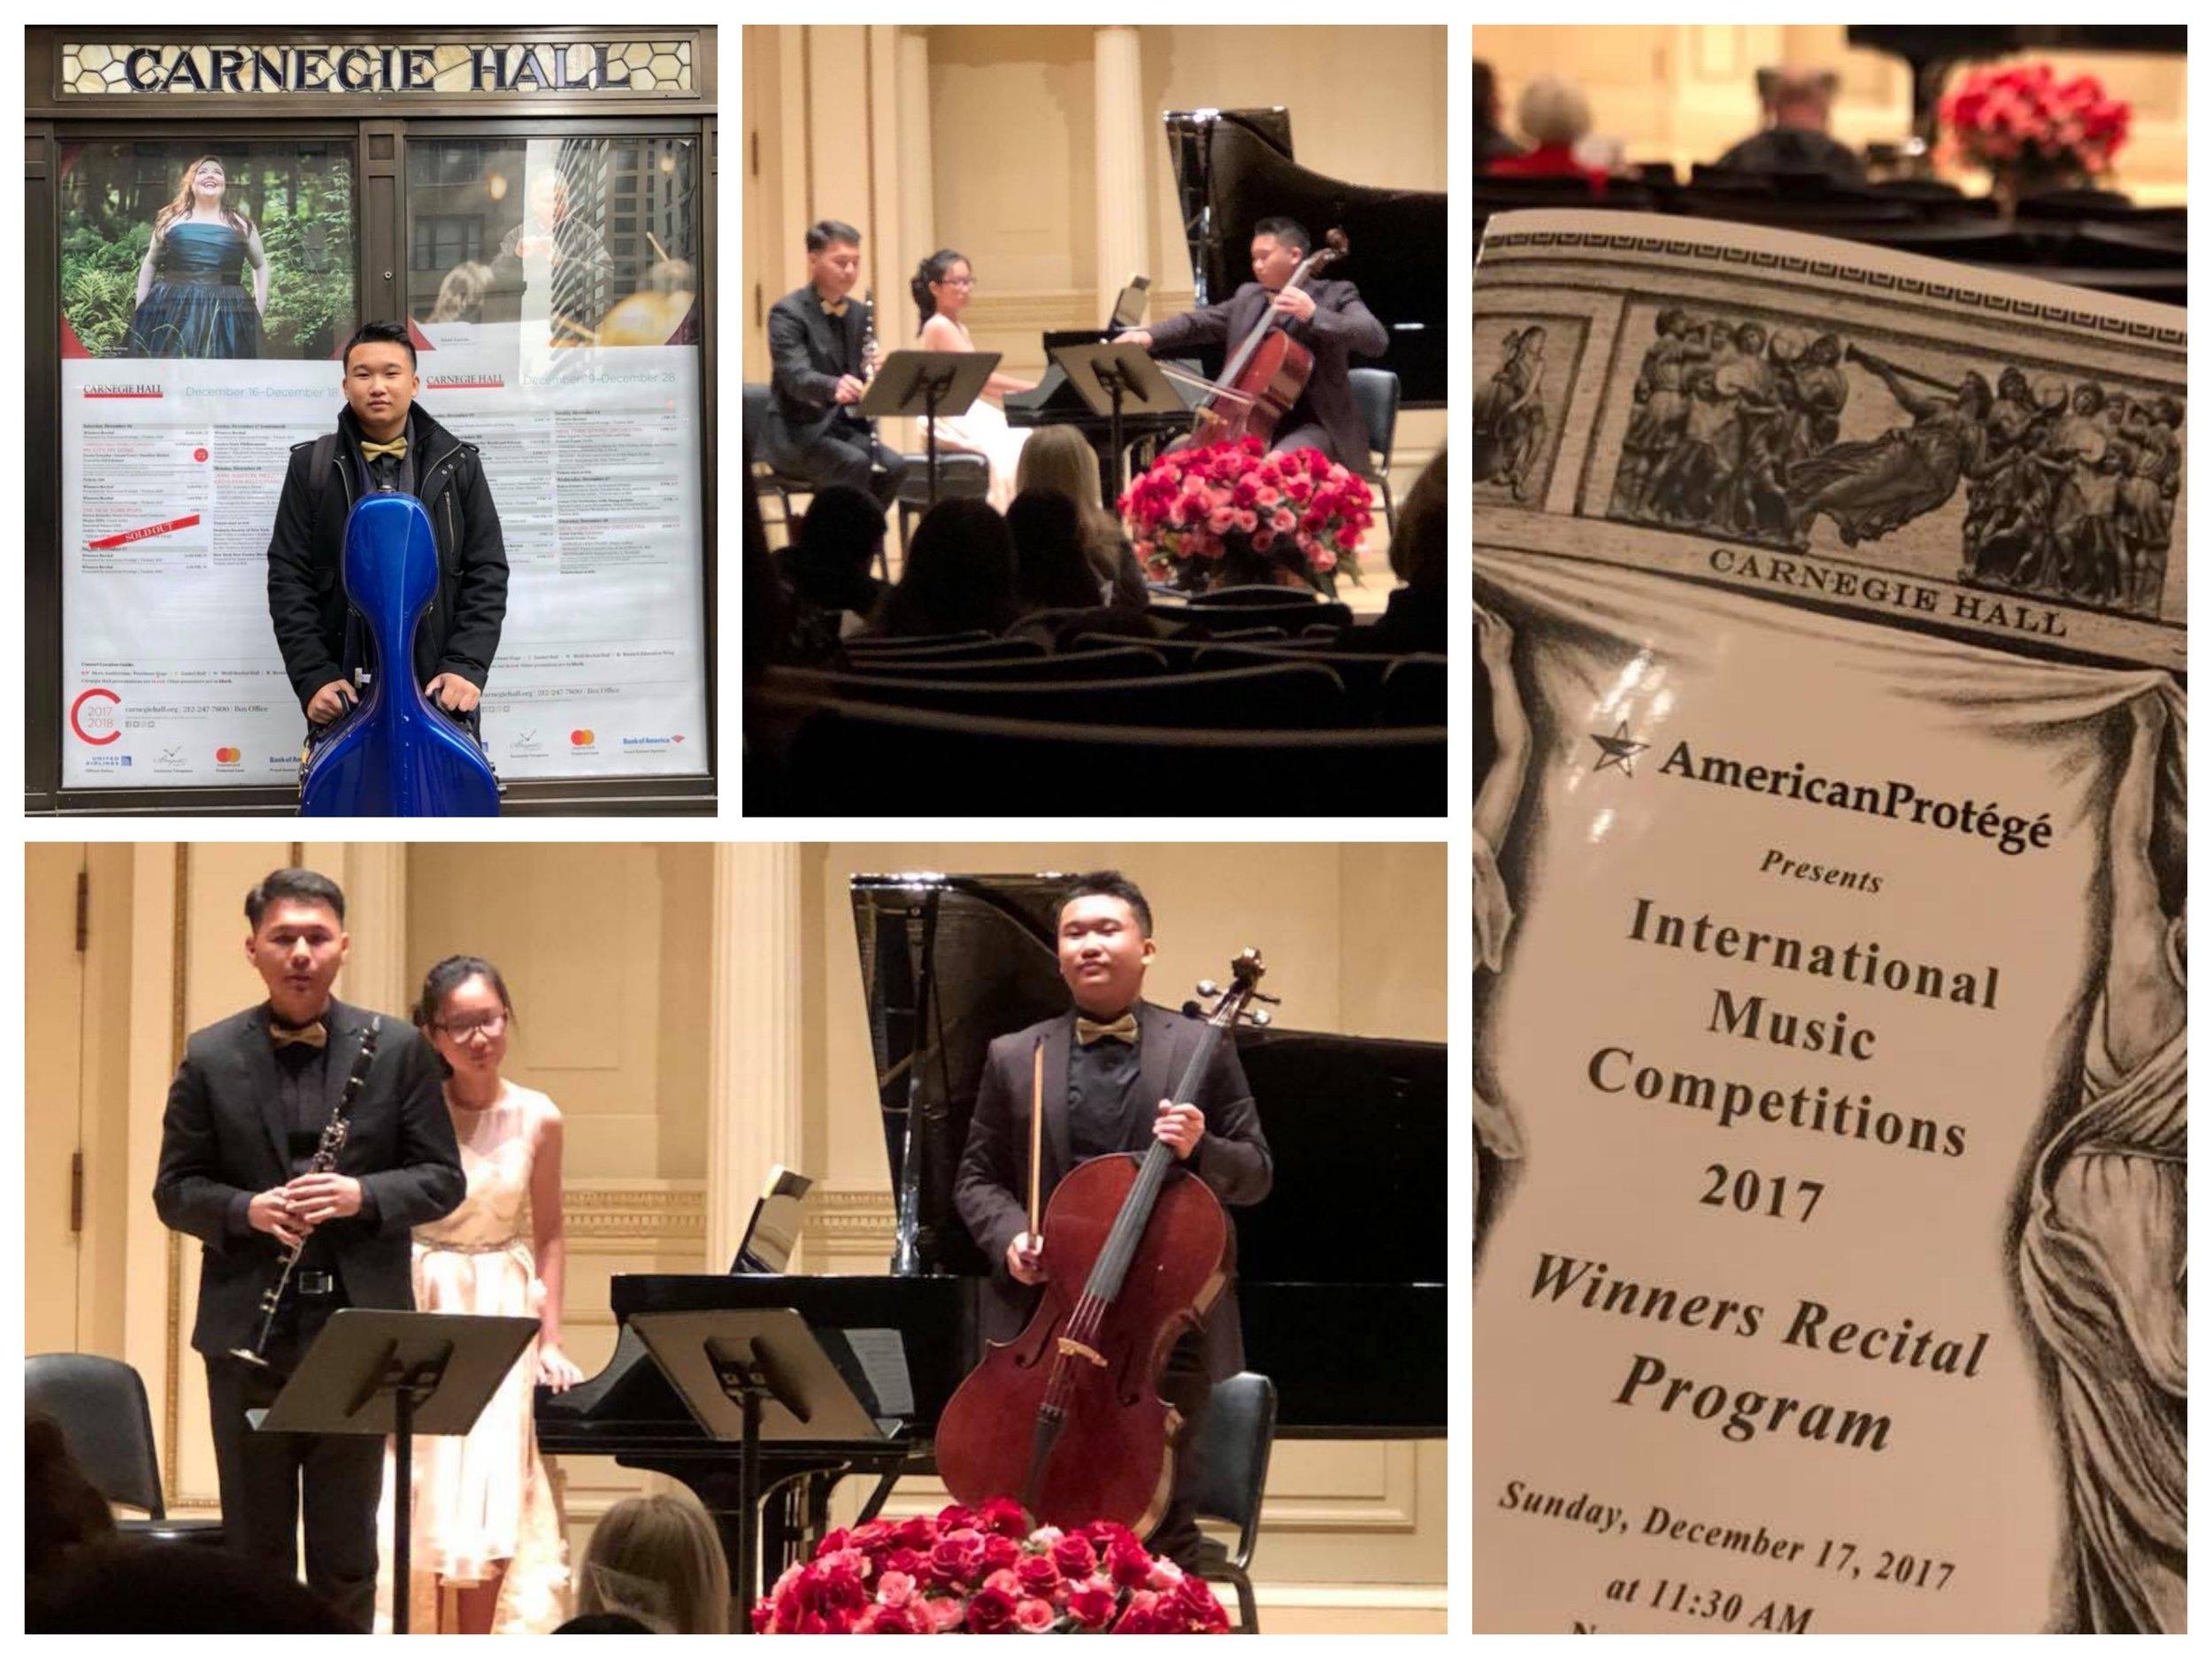 Phillip SuwandiAge 16 - Carnegie Hall Dec 2017